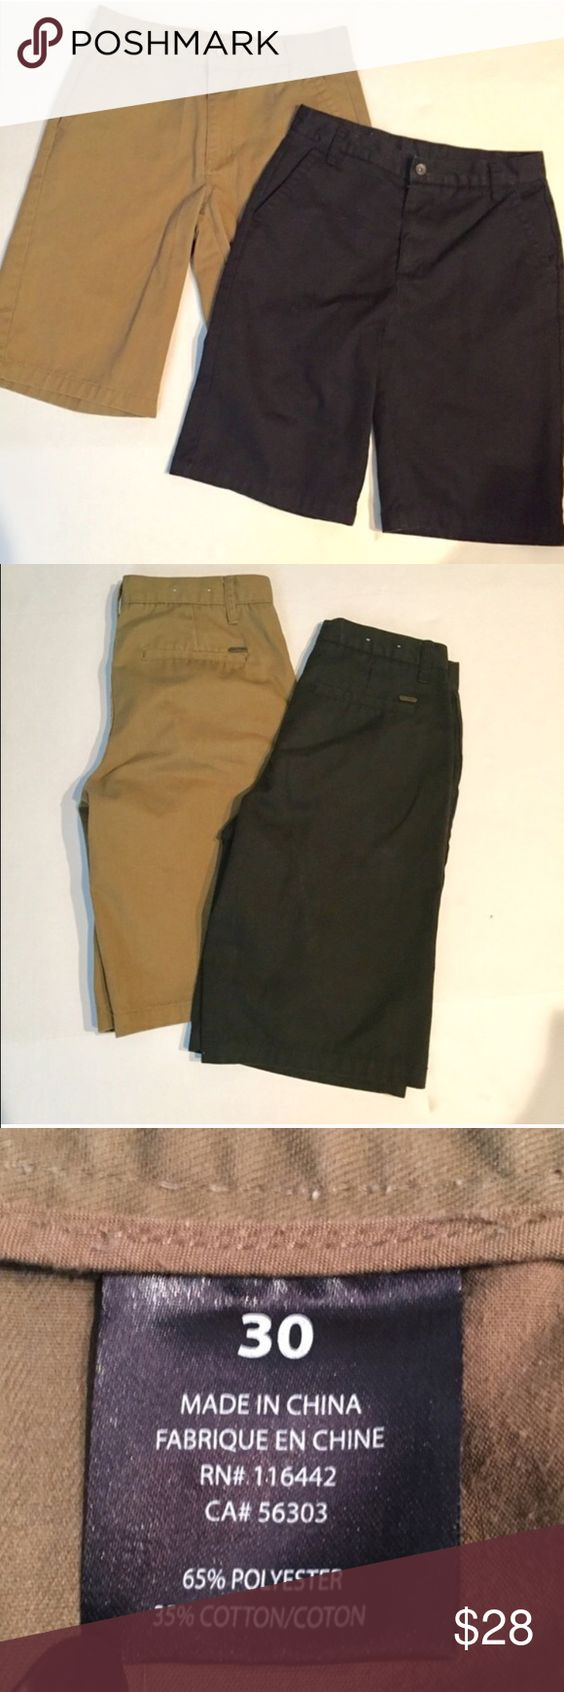 Mens zumiez brand free world shorts